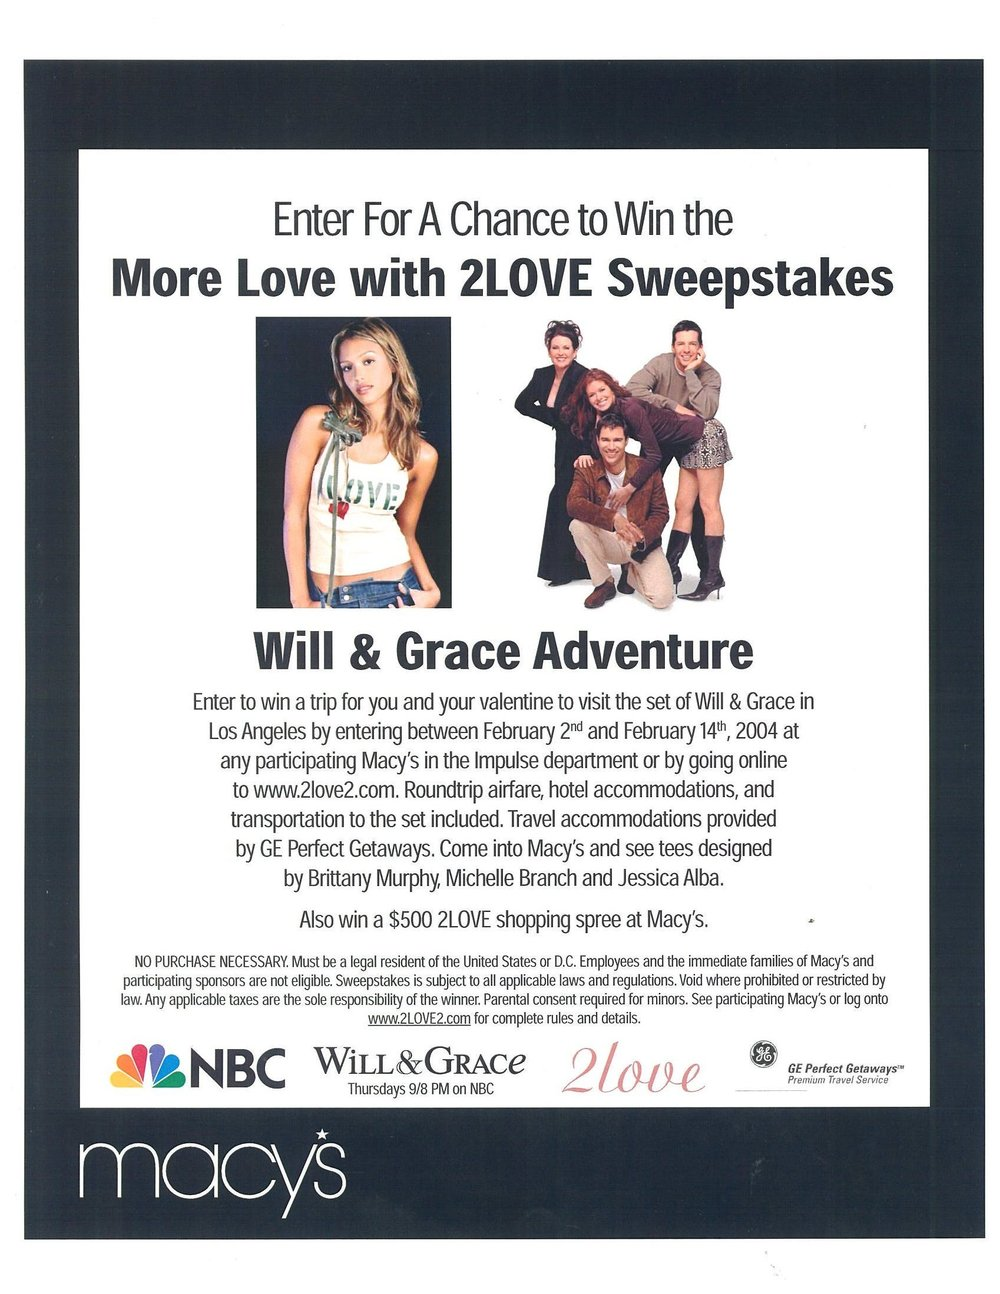 macys 2 LOVE NBC promo.jpg